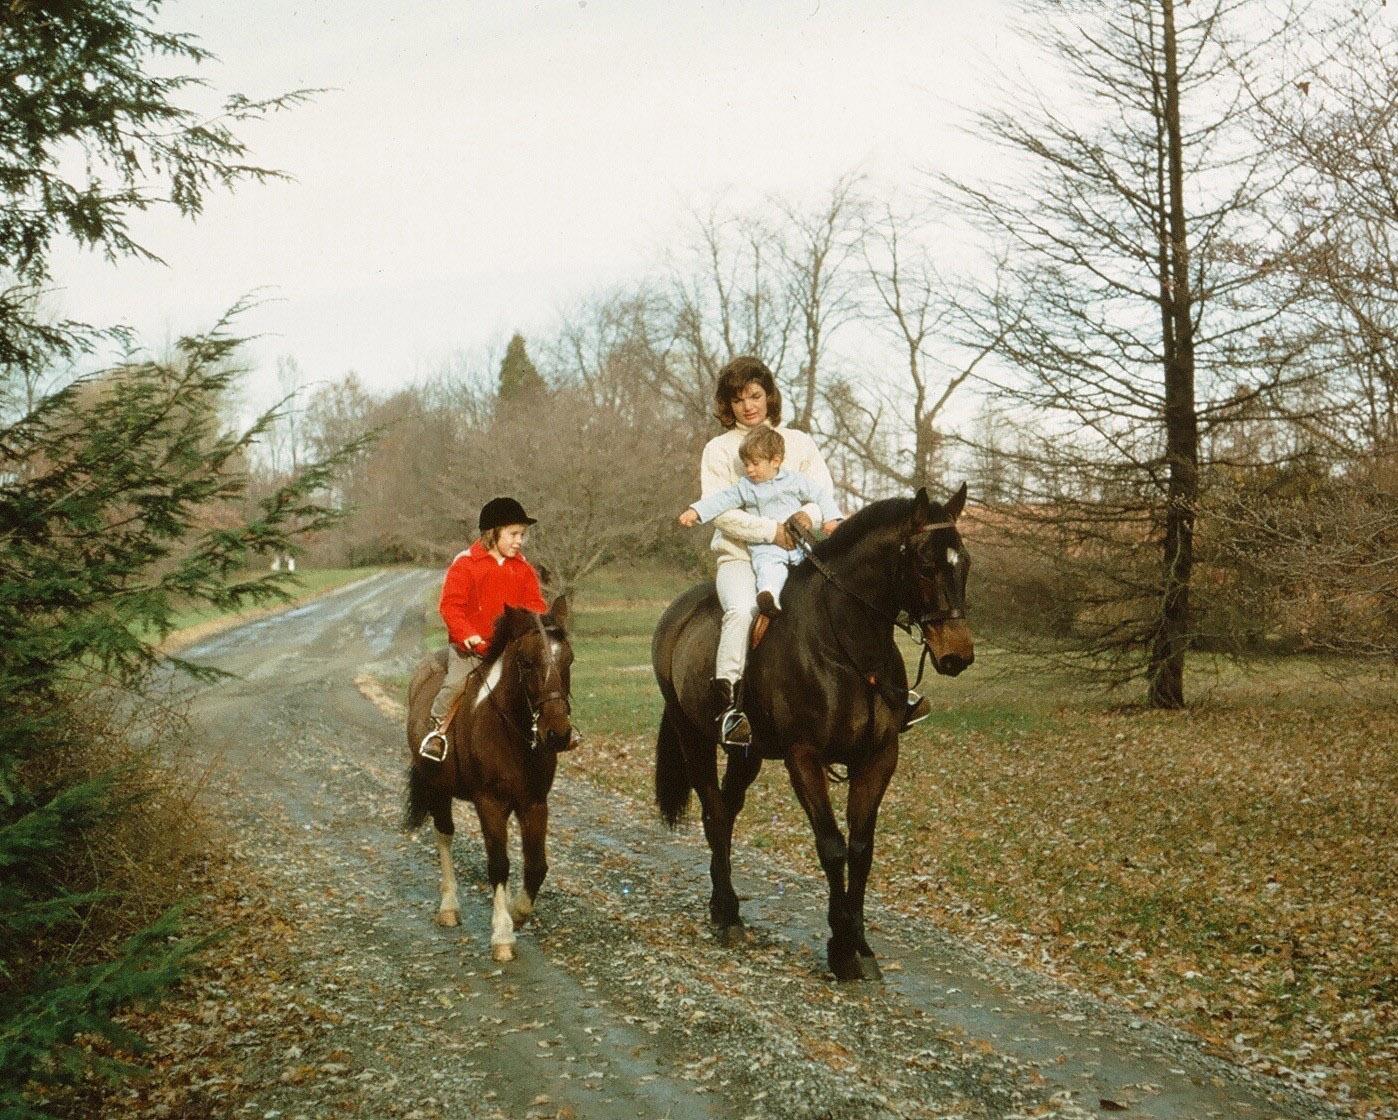 Meghan and Harry visit prestigious equestrian club in Morocco